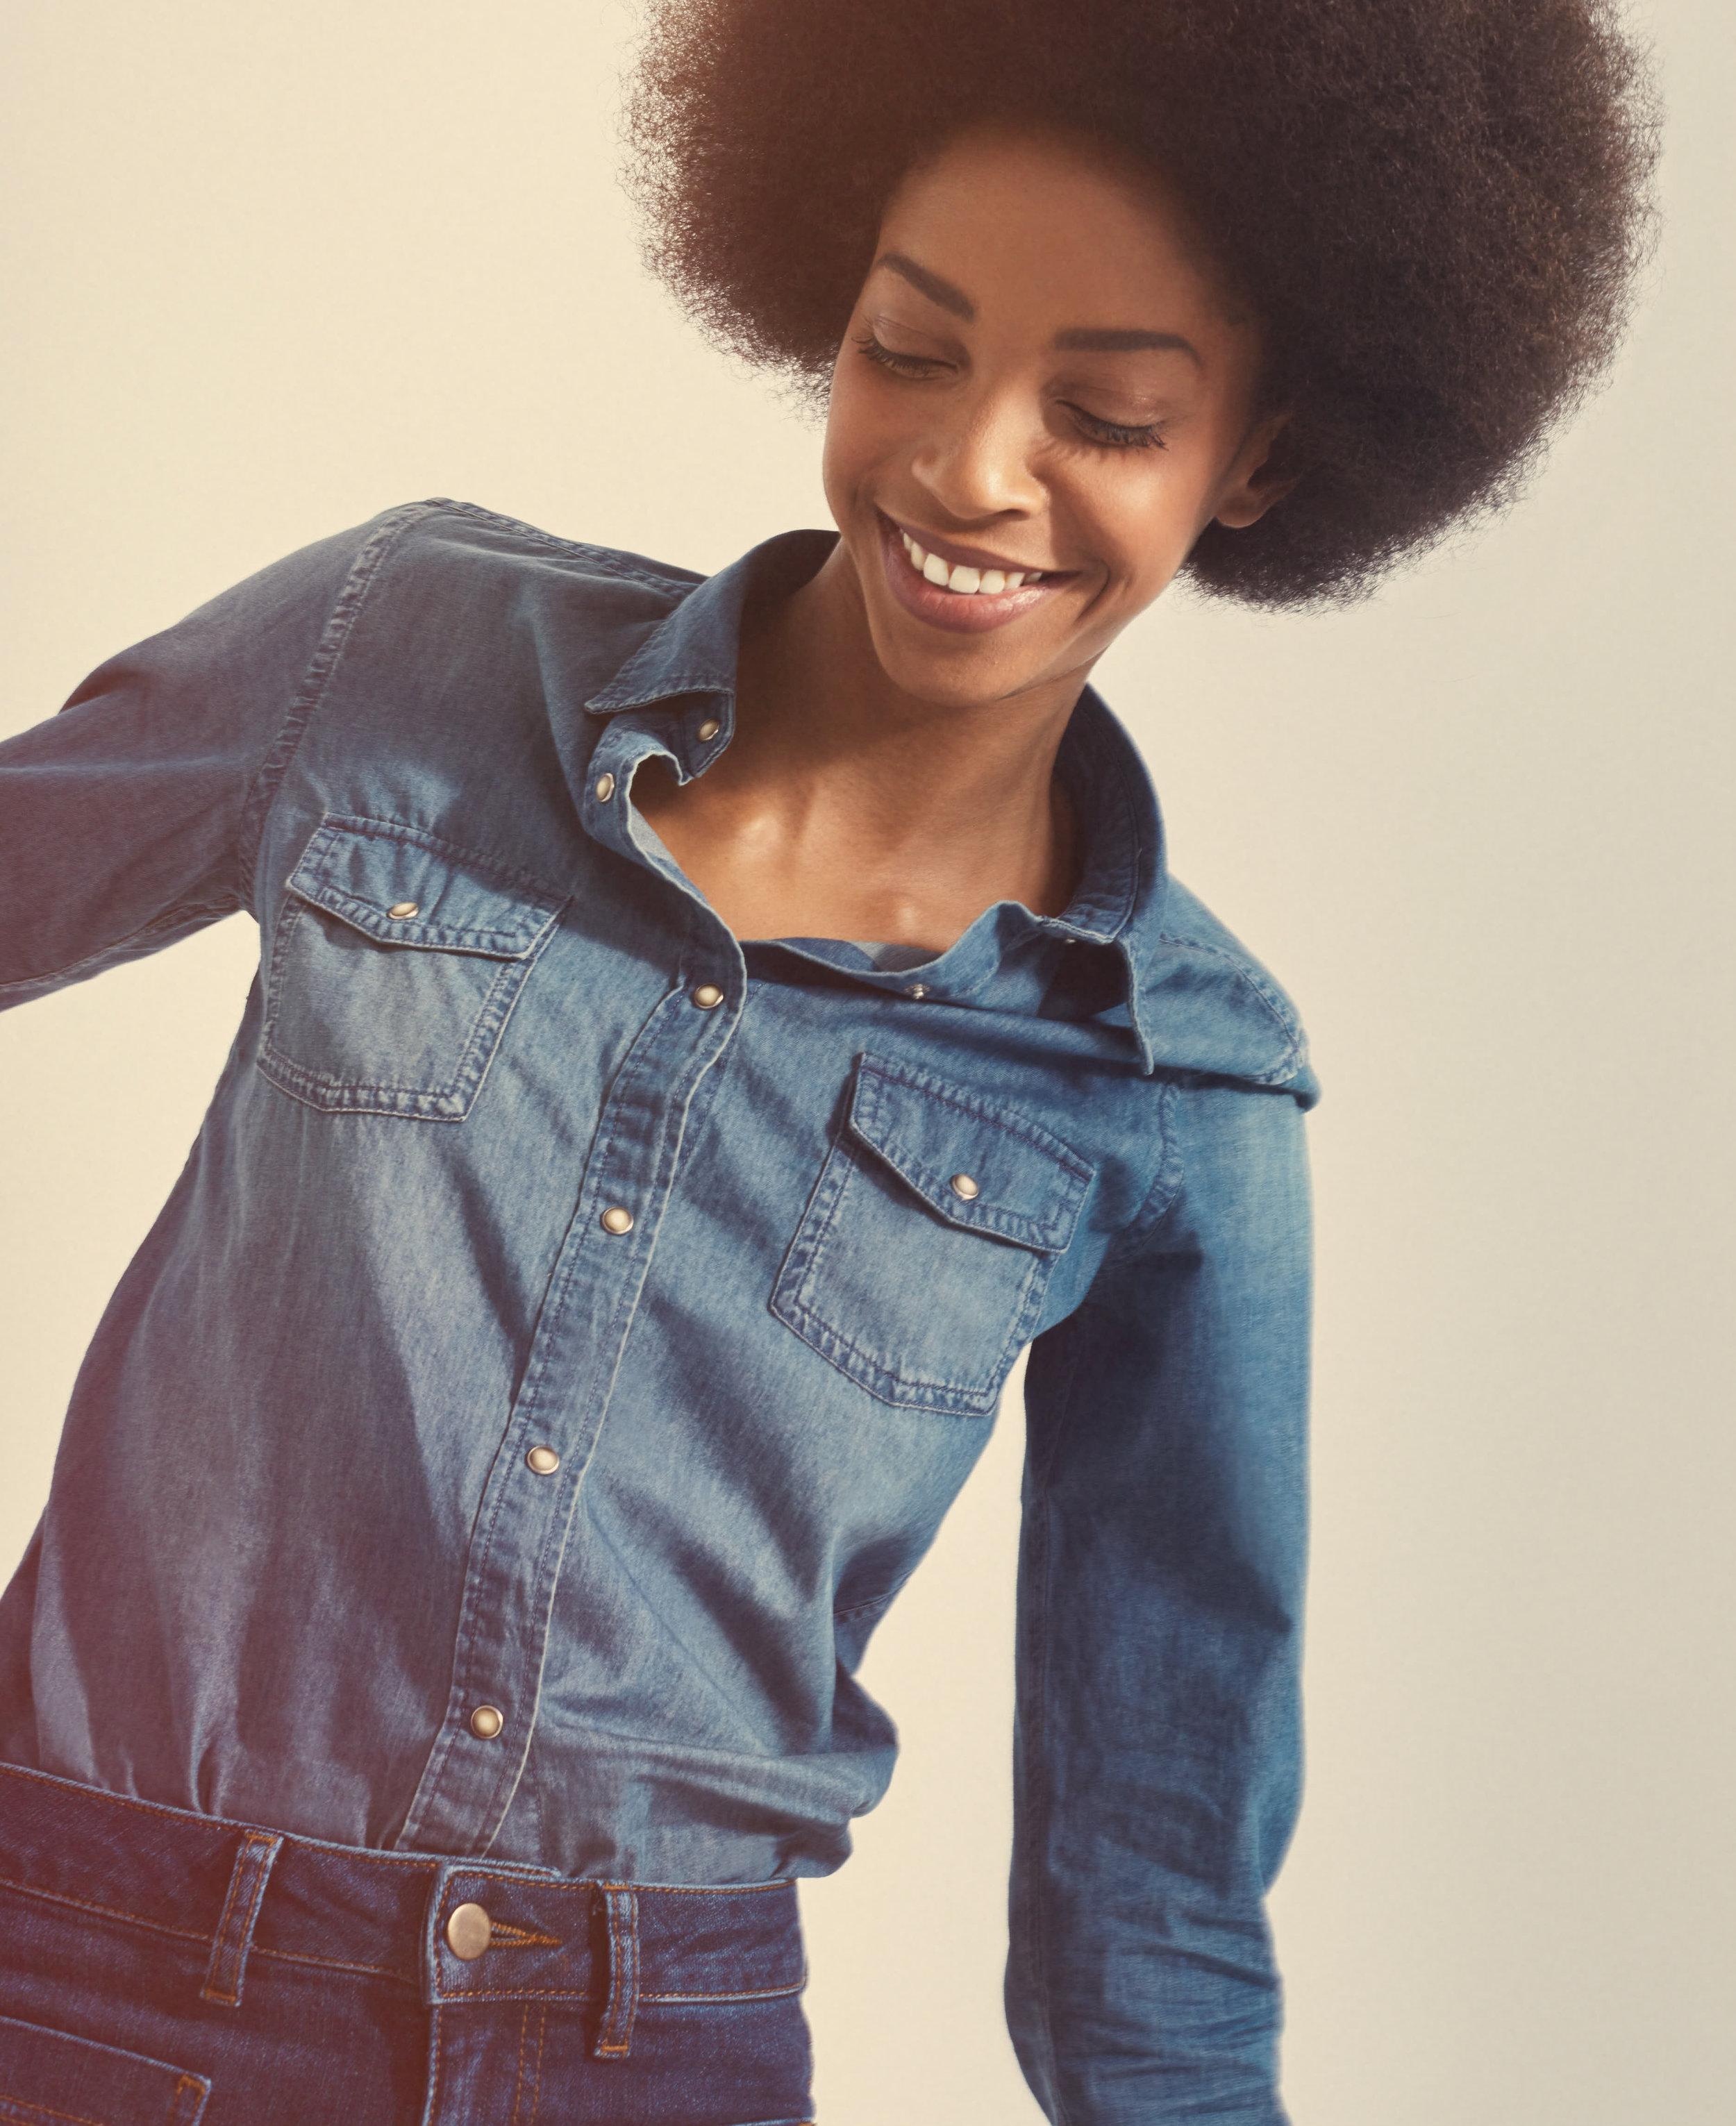 Retro-Afro-Girl-Laughing-Womenswear